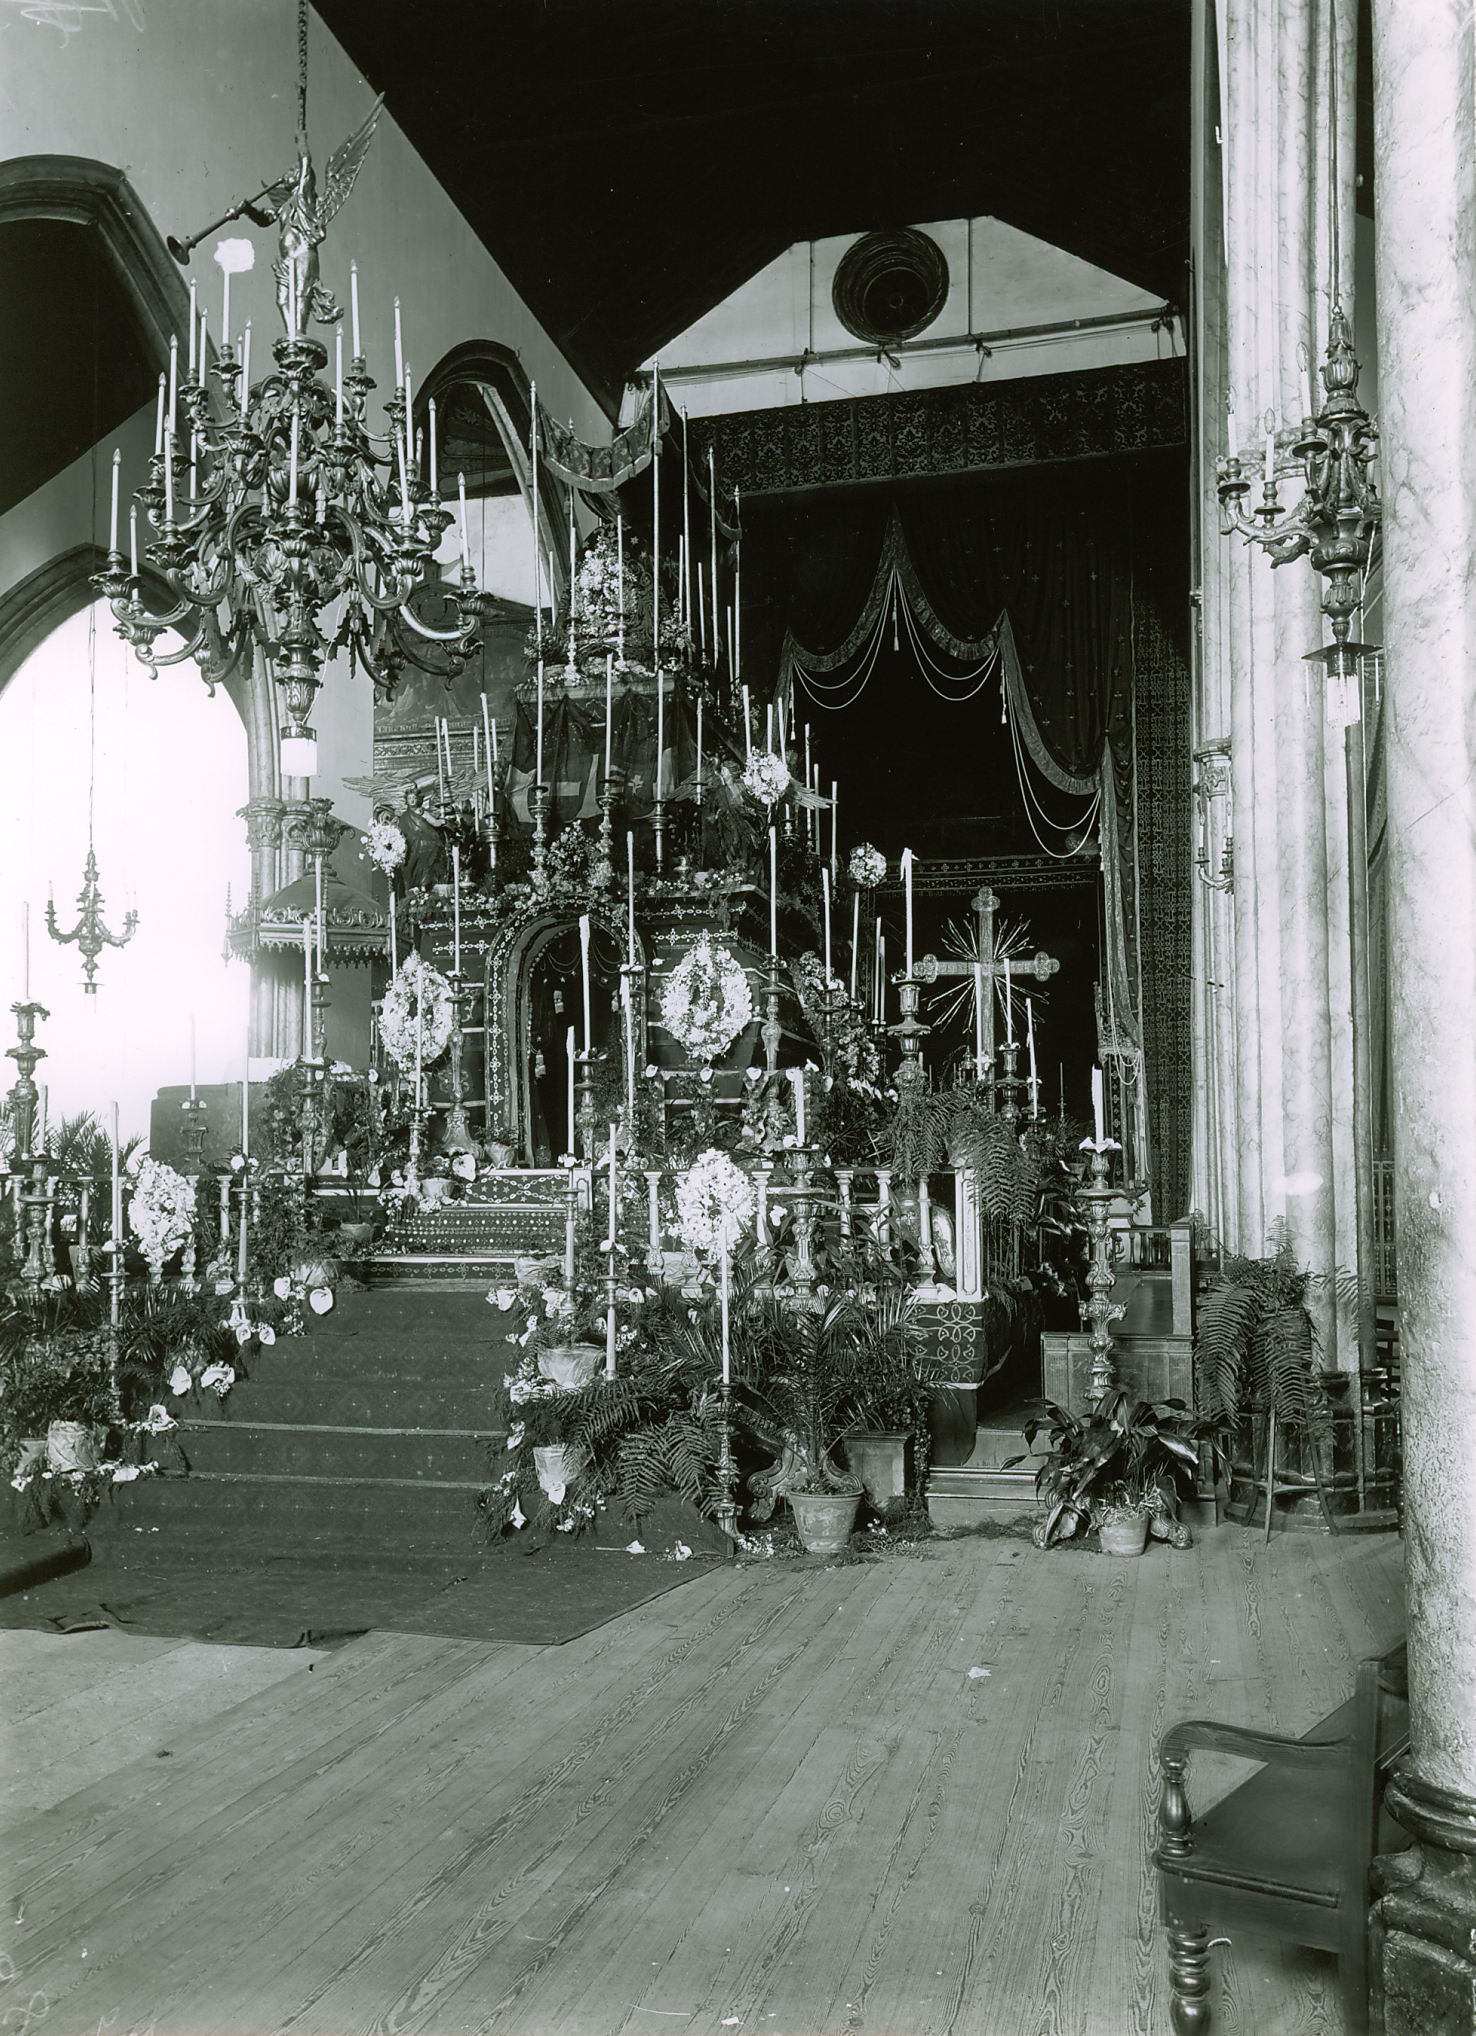 The Requiem Catafalque Erected For Emperor Karl